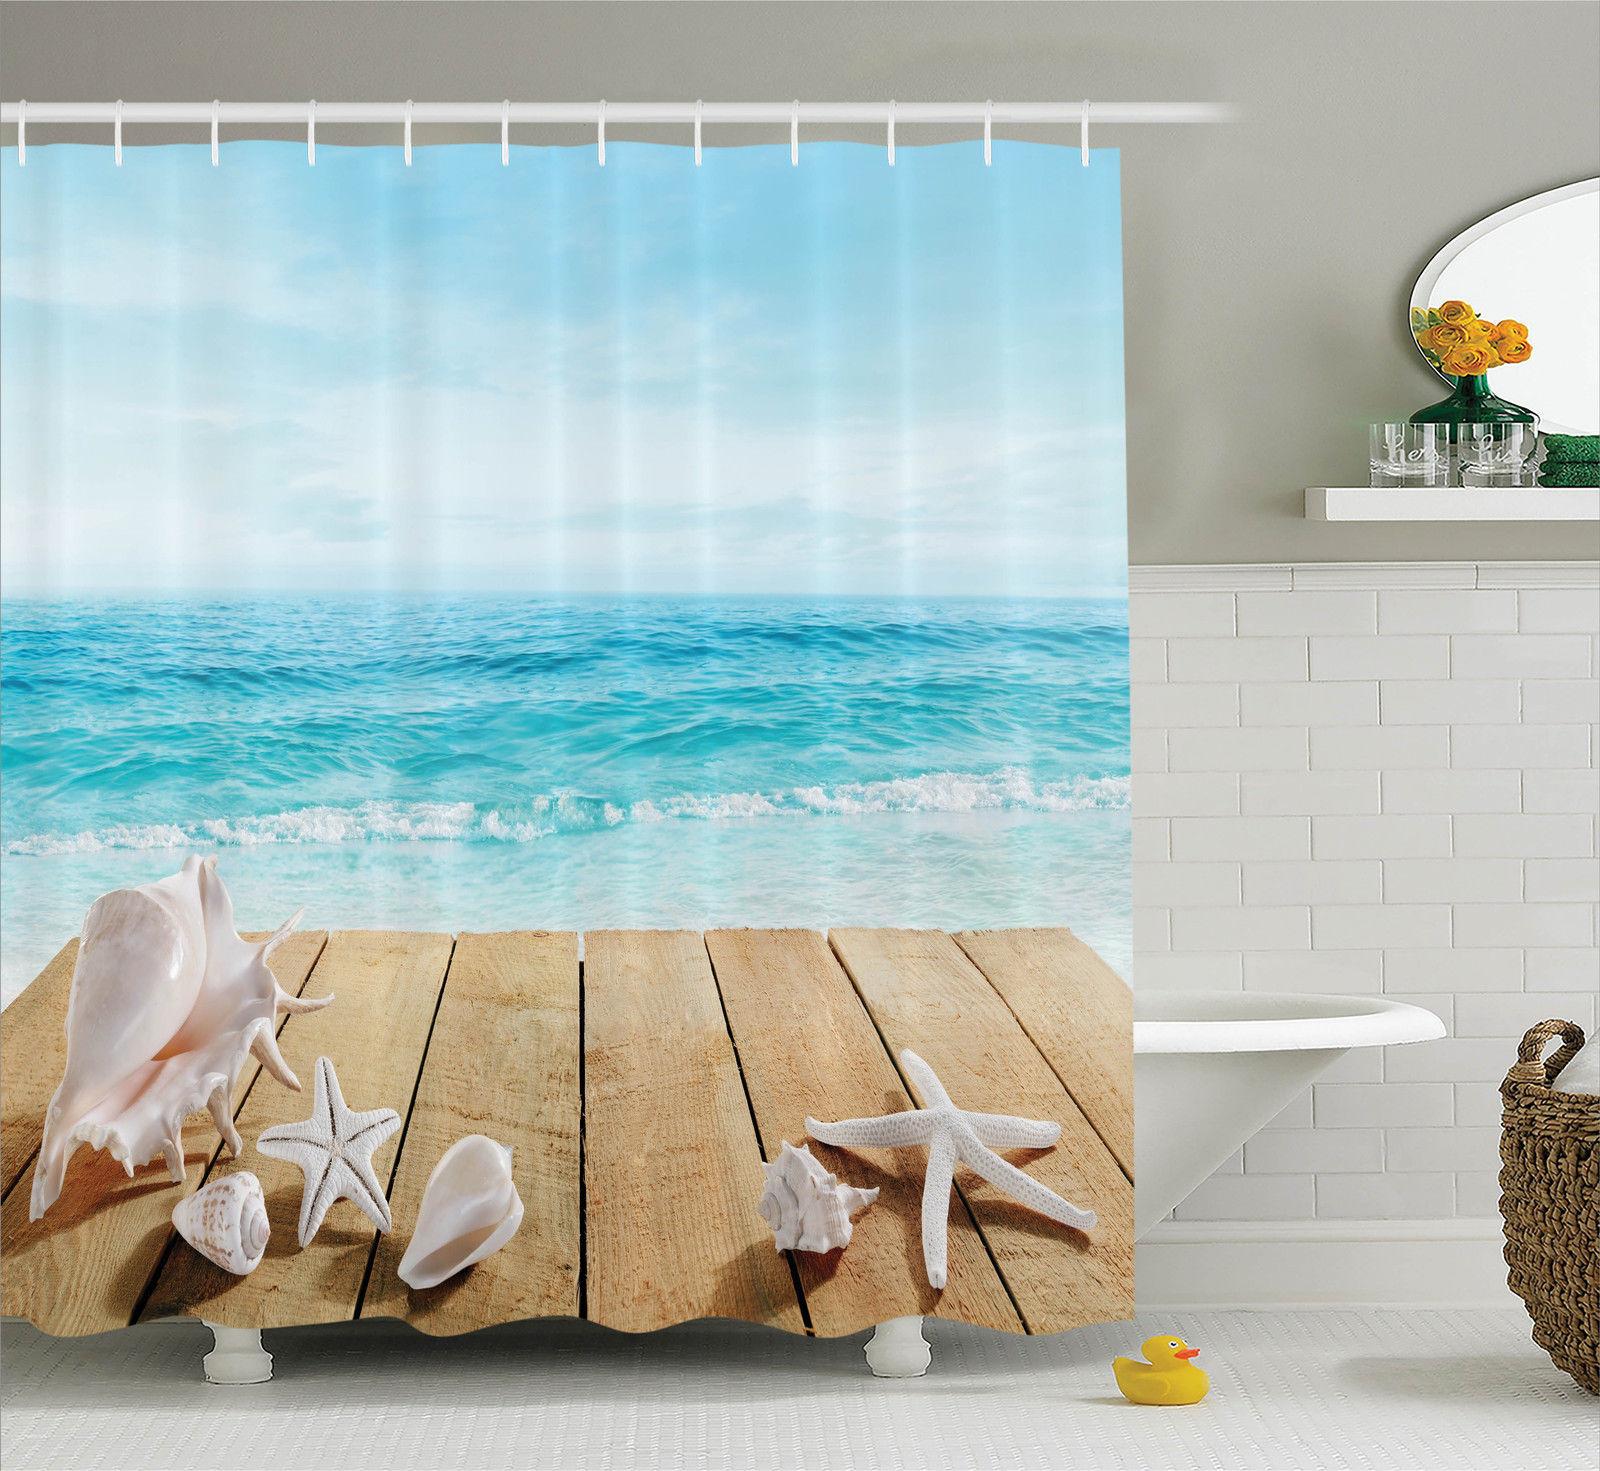 Walmart & Beach Themed Bath Decor